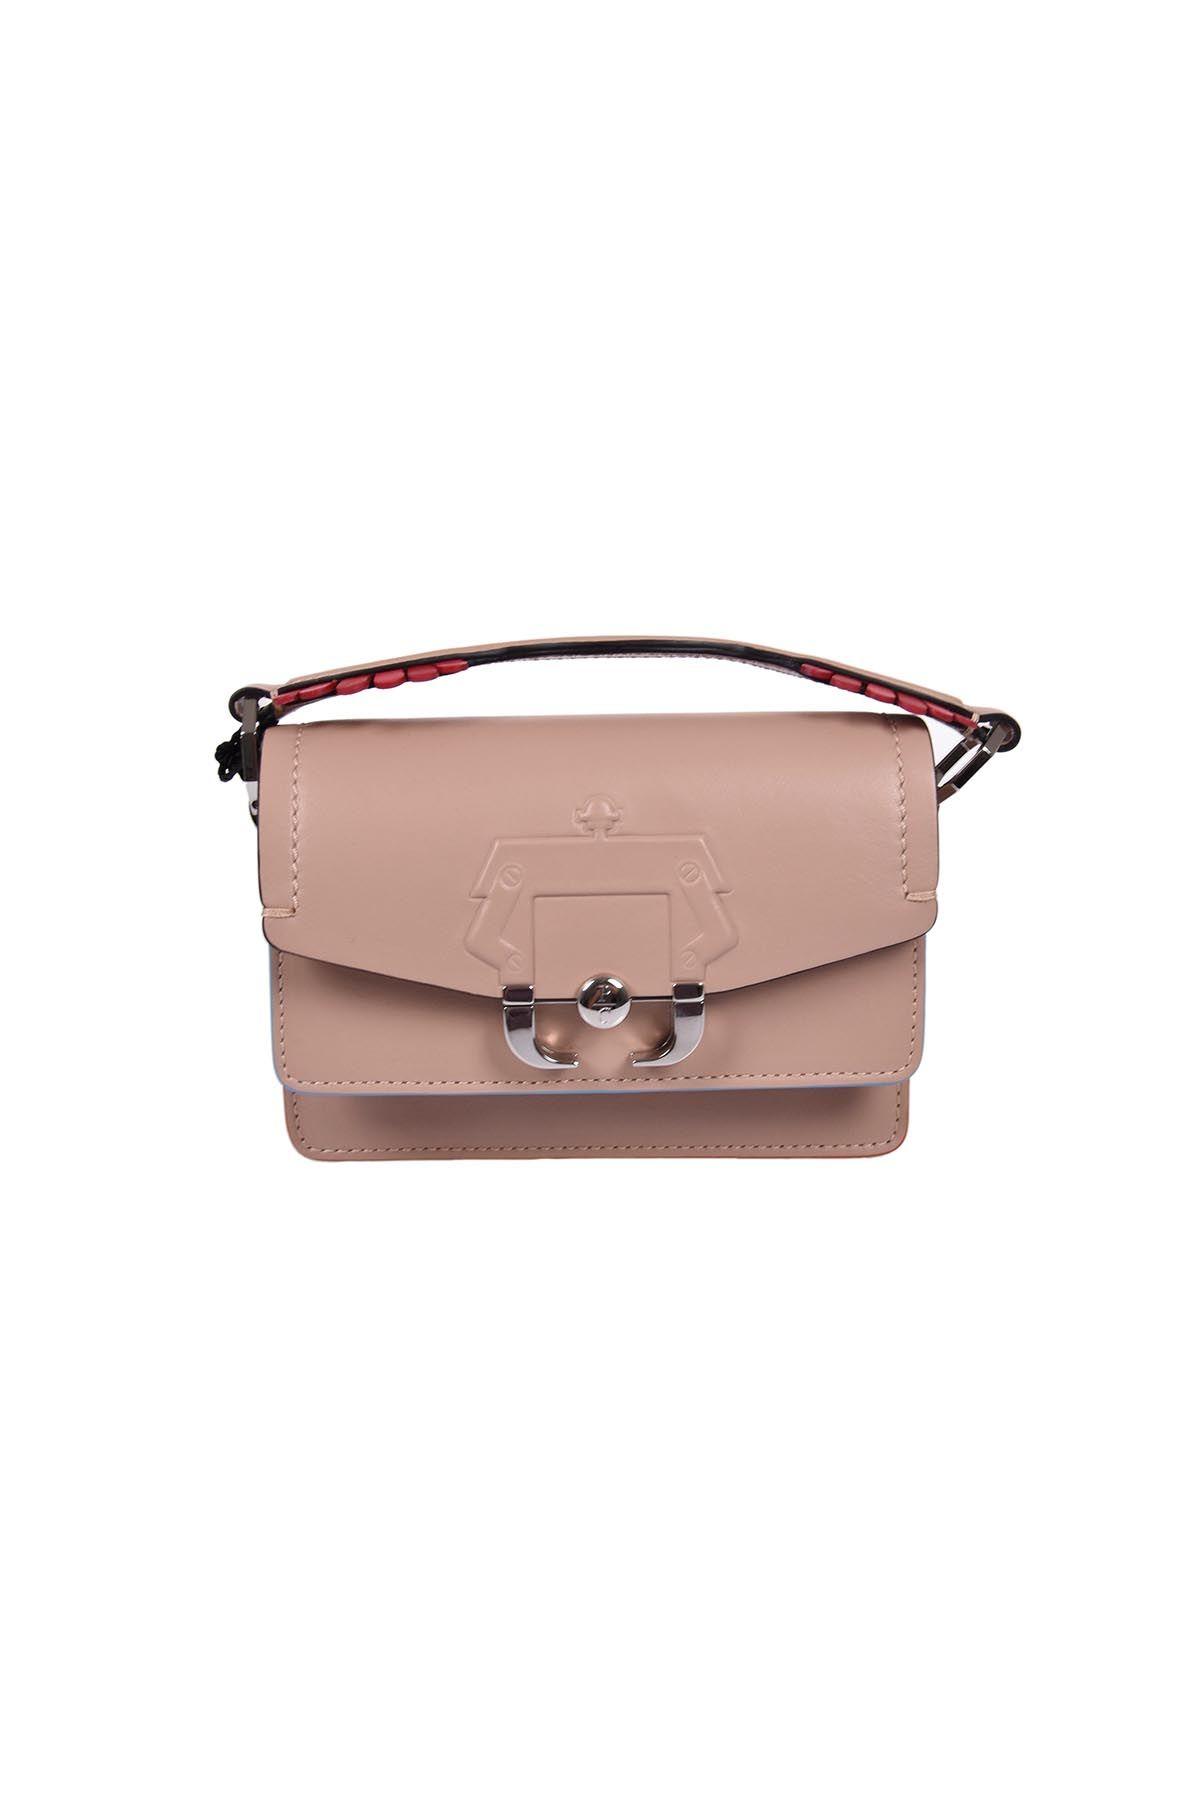 Paula Cademartori Twi Twi Mini Bag